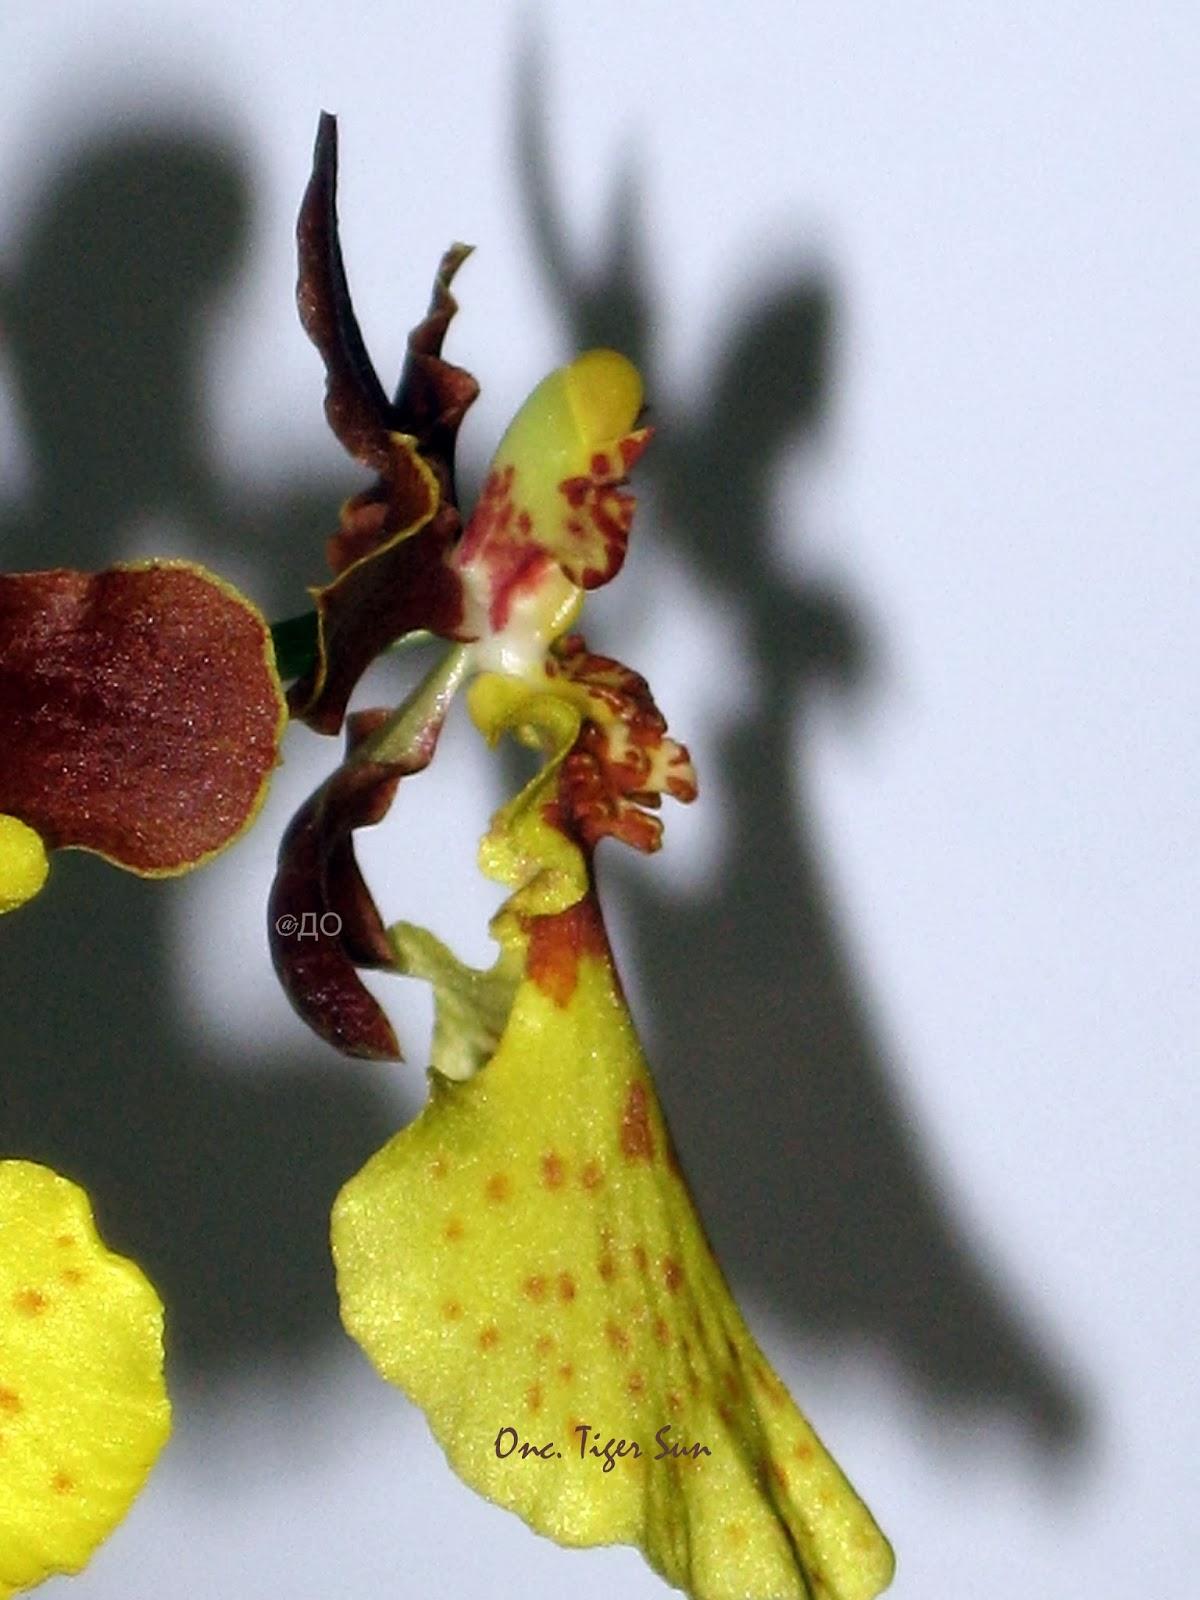 Oncidium Tiger Sun - я самый-самый красивый